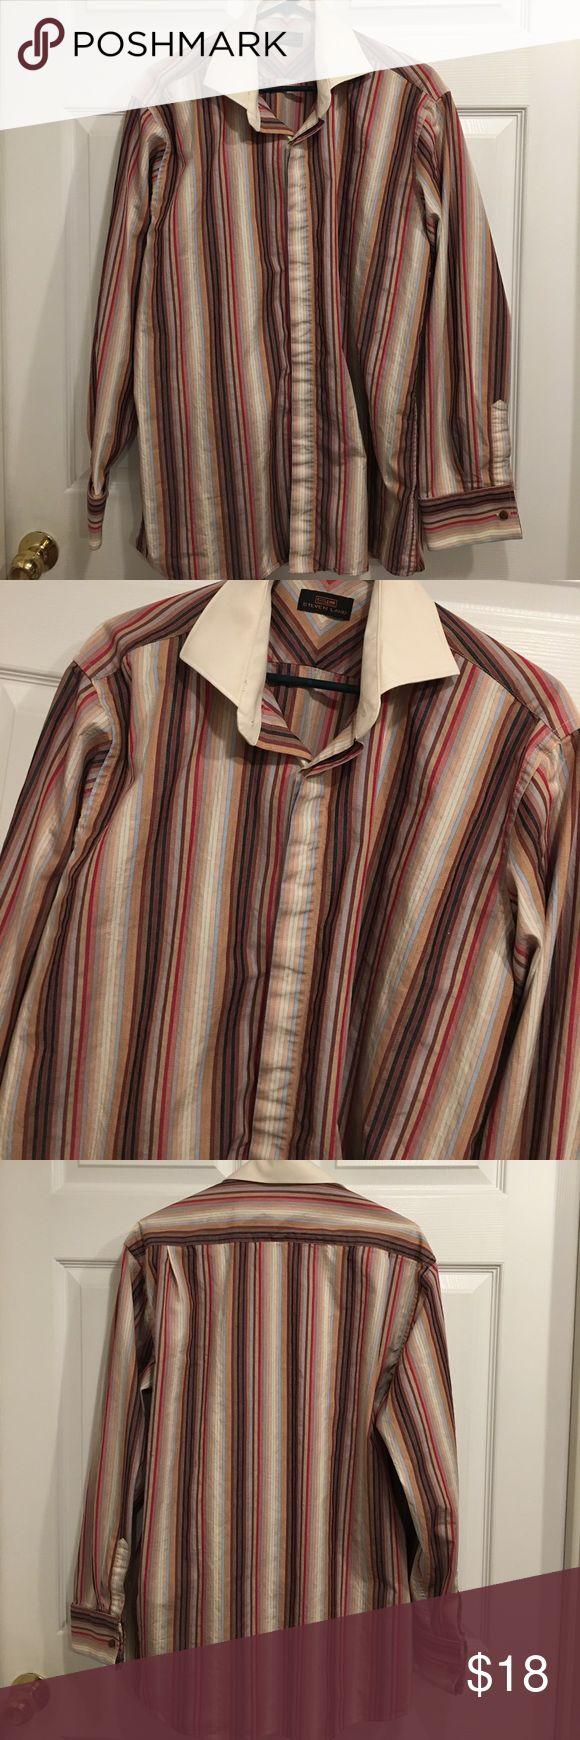 Steven Land shirt Steven land men's shirt size 16 1/2. (34-35). Like new condition 100% cotton Steven Land Shirts Casual Button Down Shirts